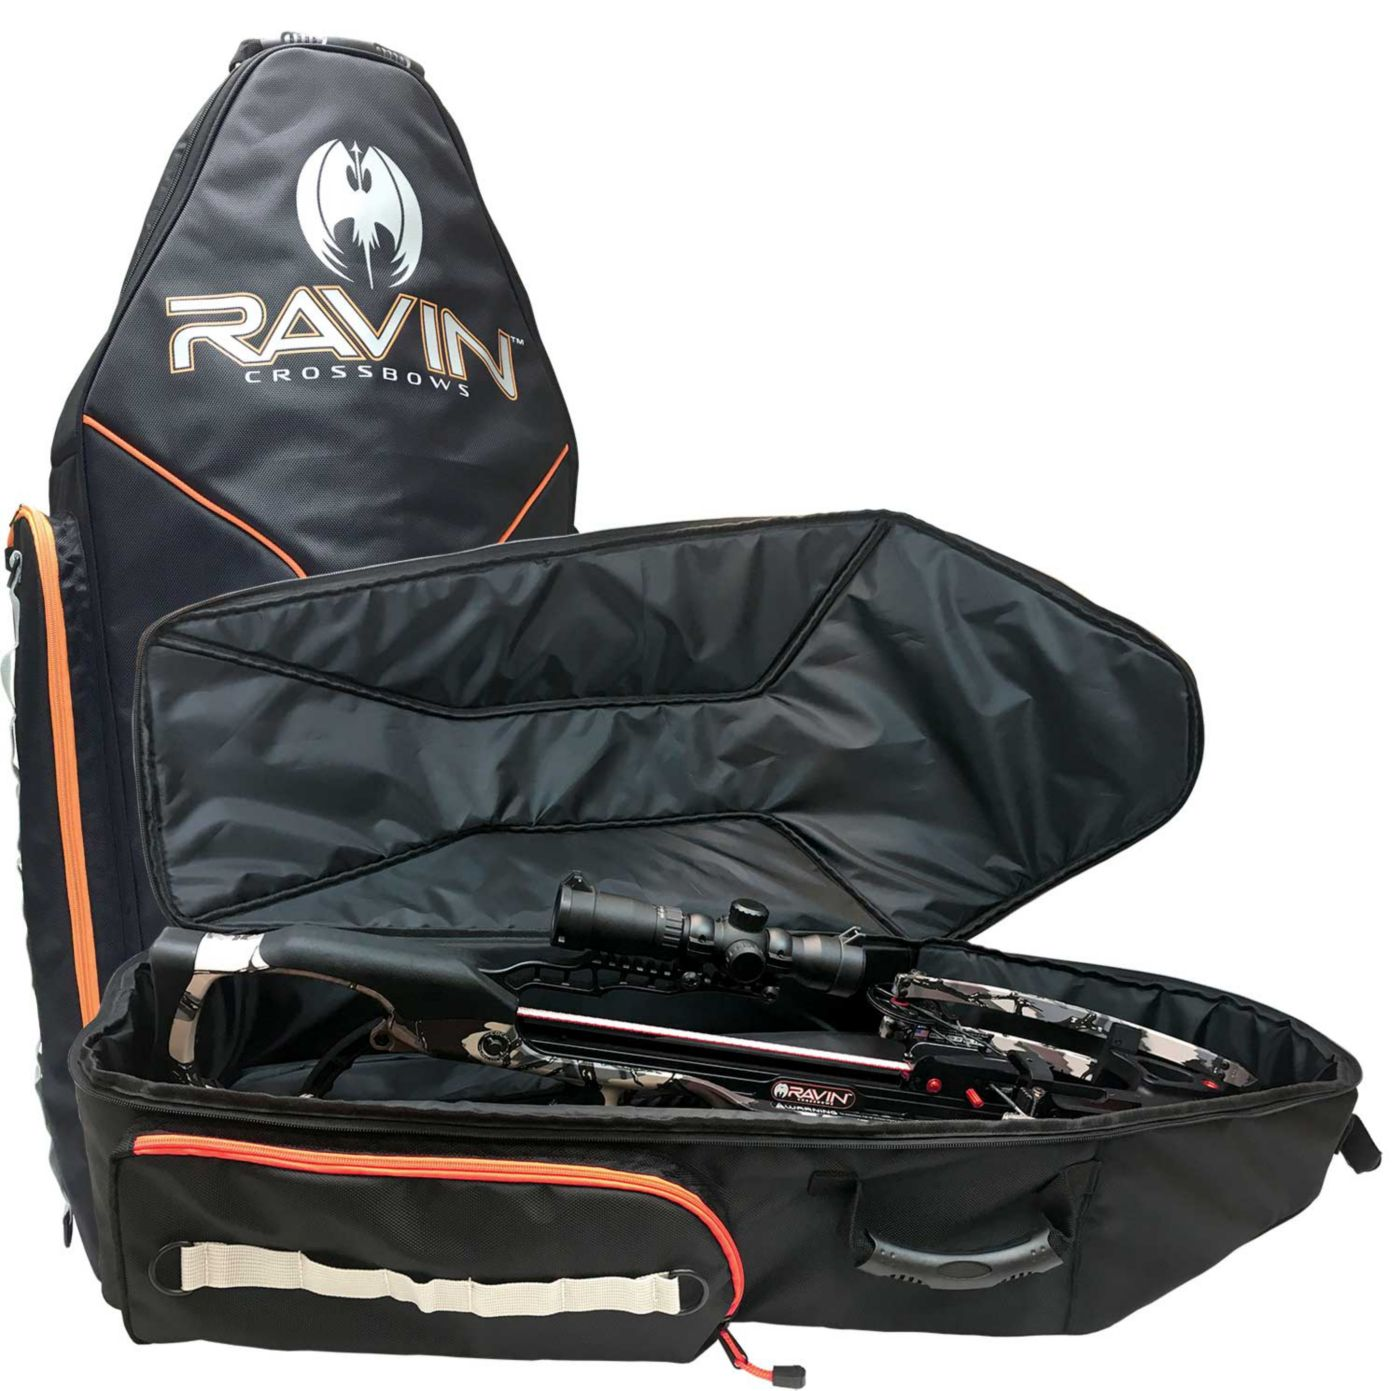 Ravin Crossbows Soft Crossbow Case